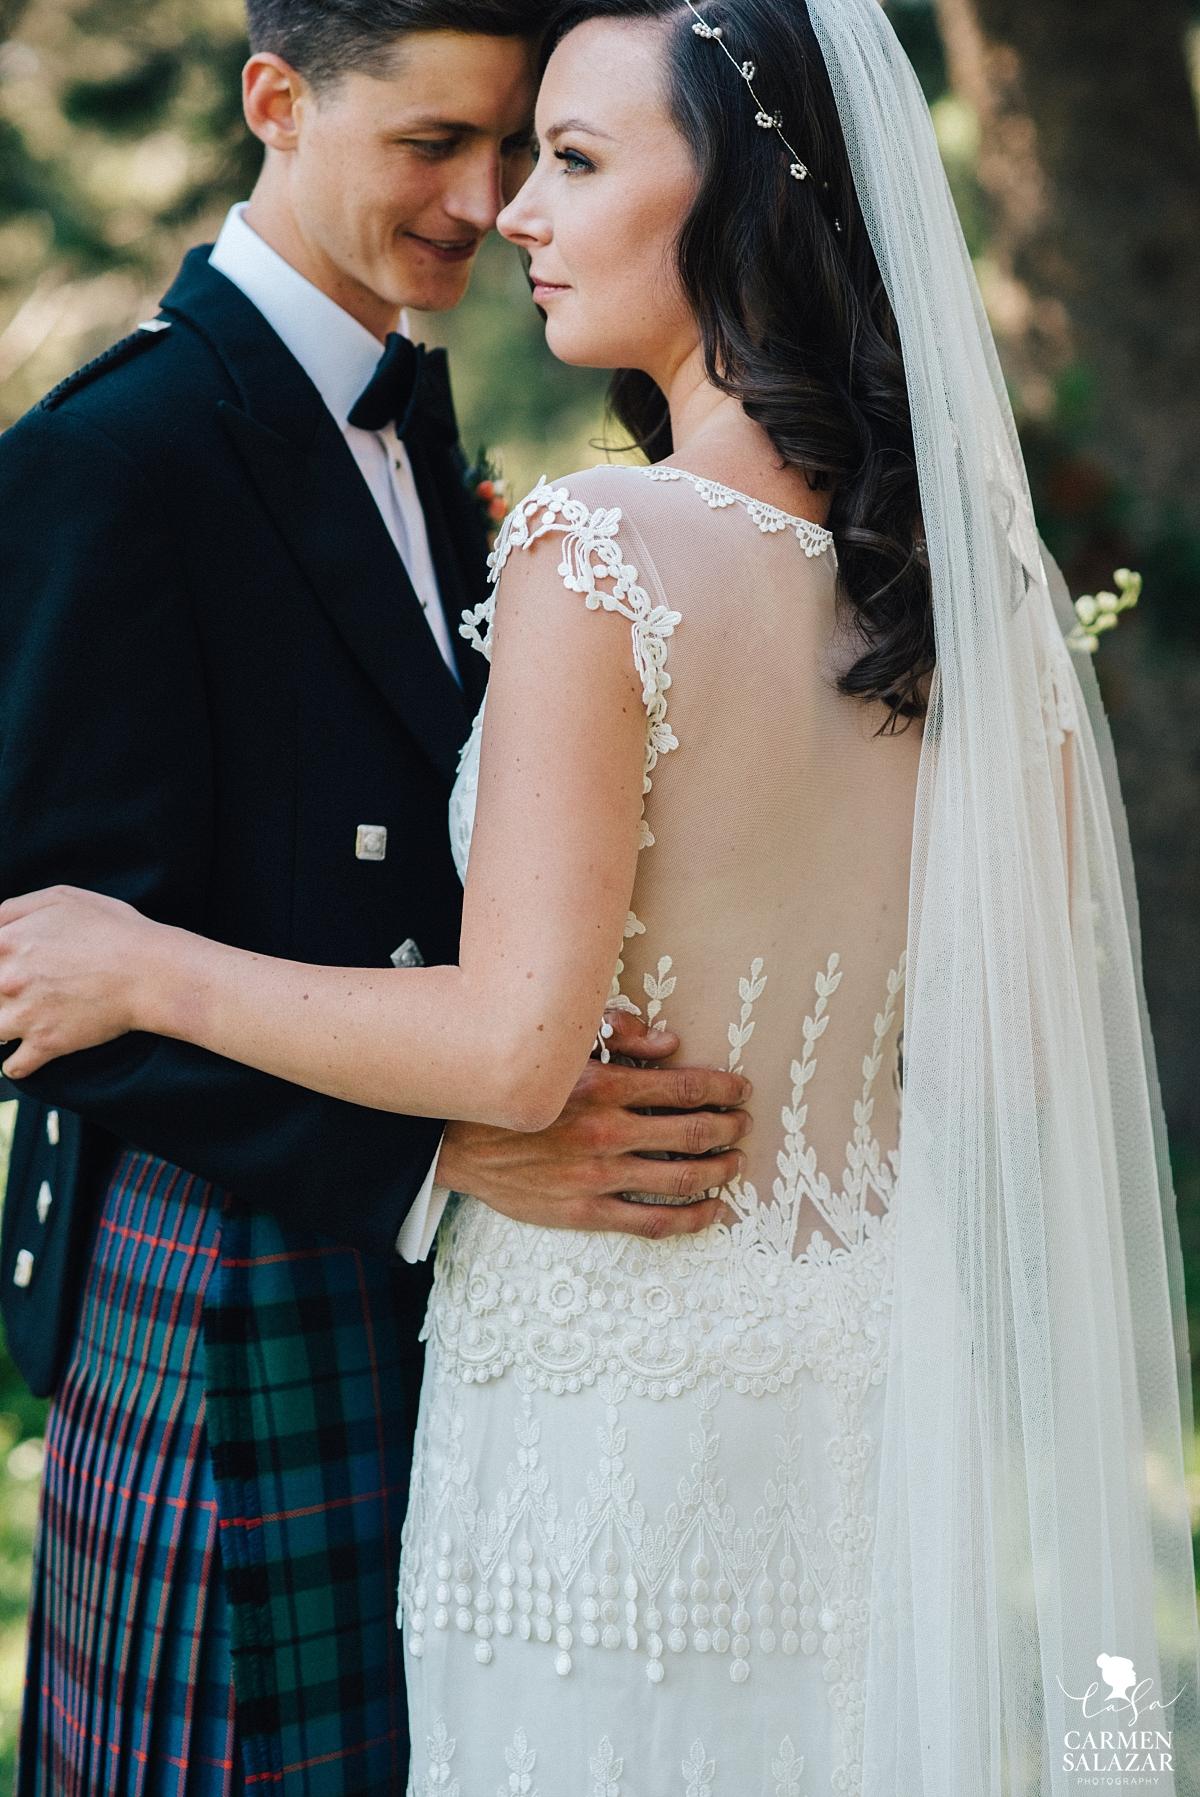 Newlyweds at The Hideout Kirkwood, CA - Carmen Salazar